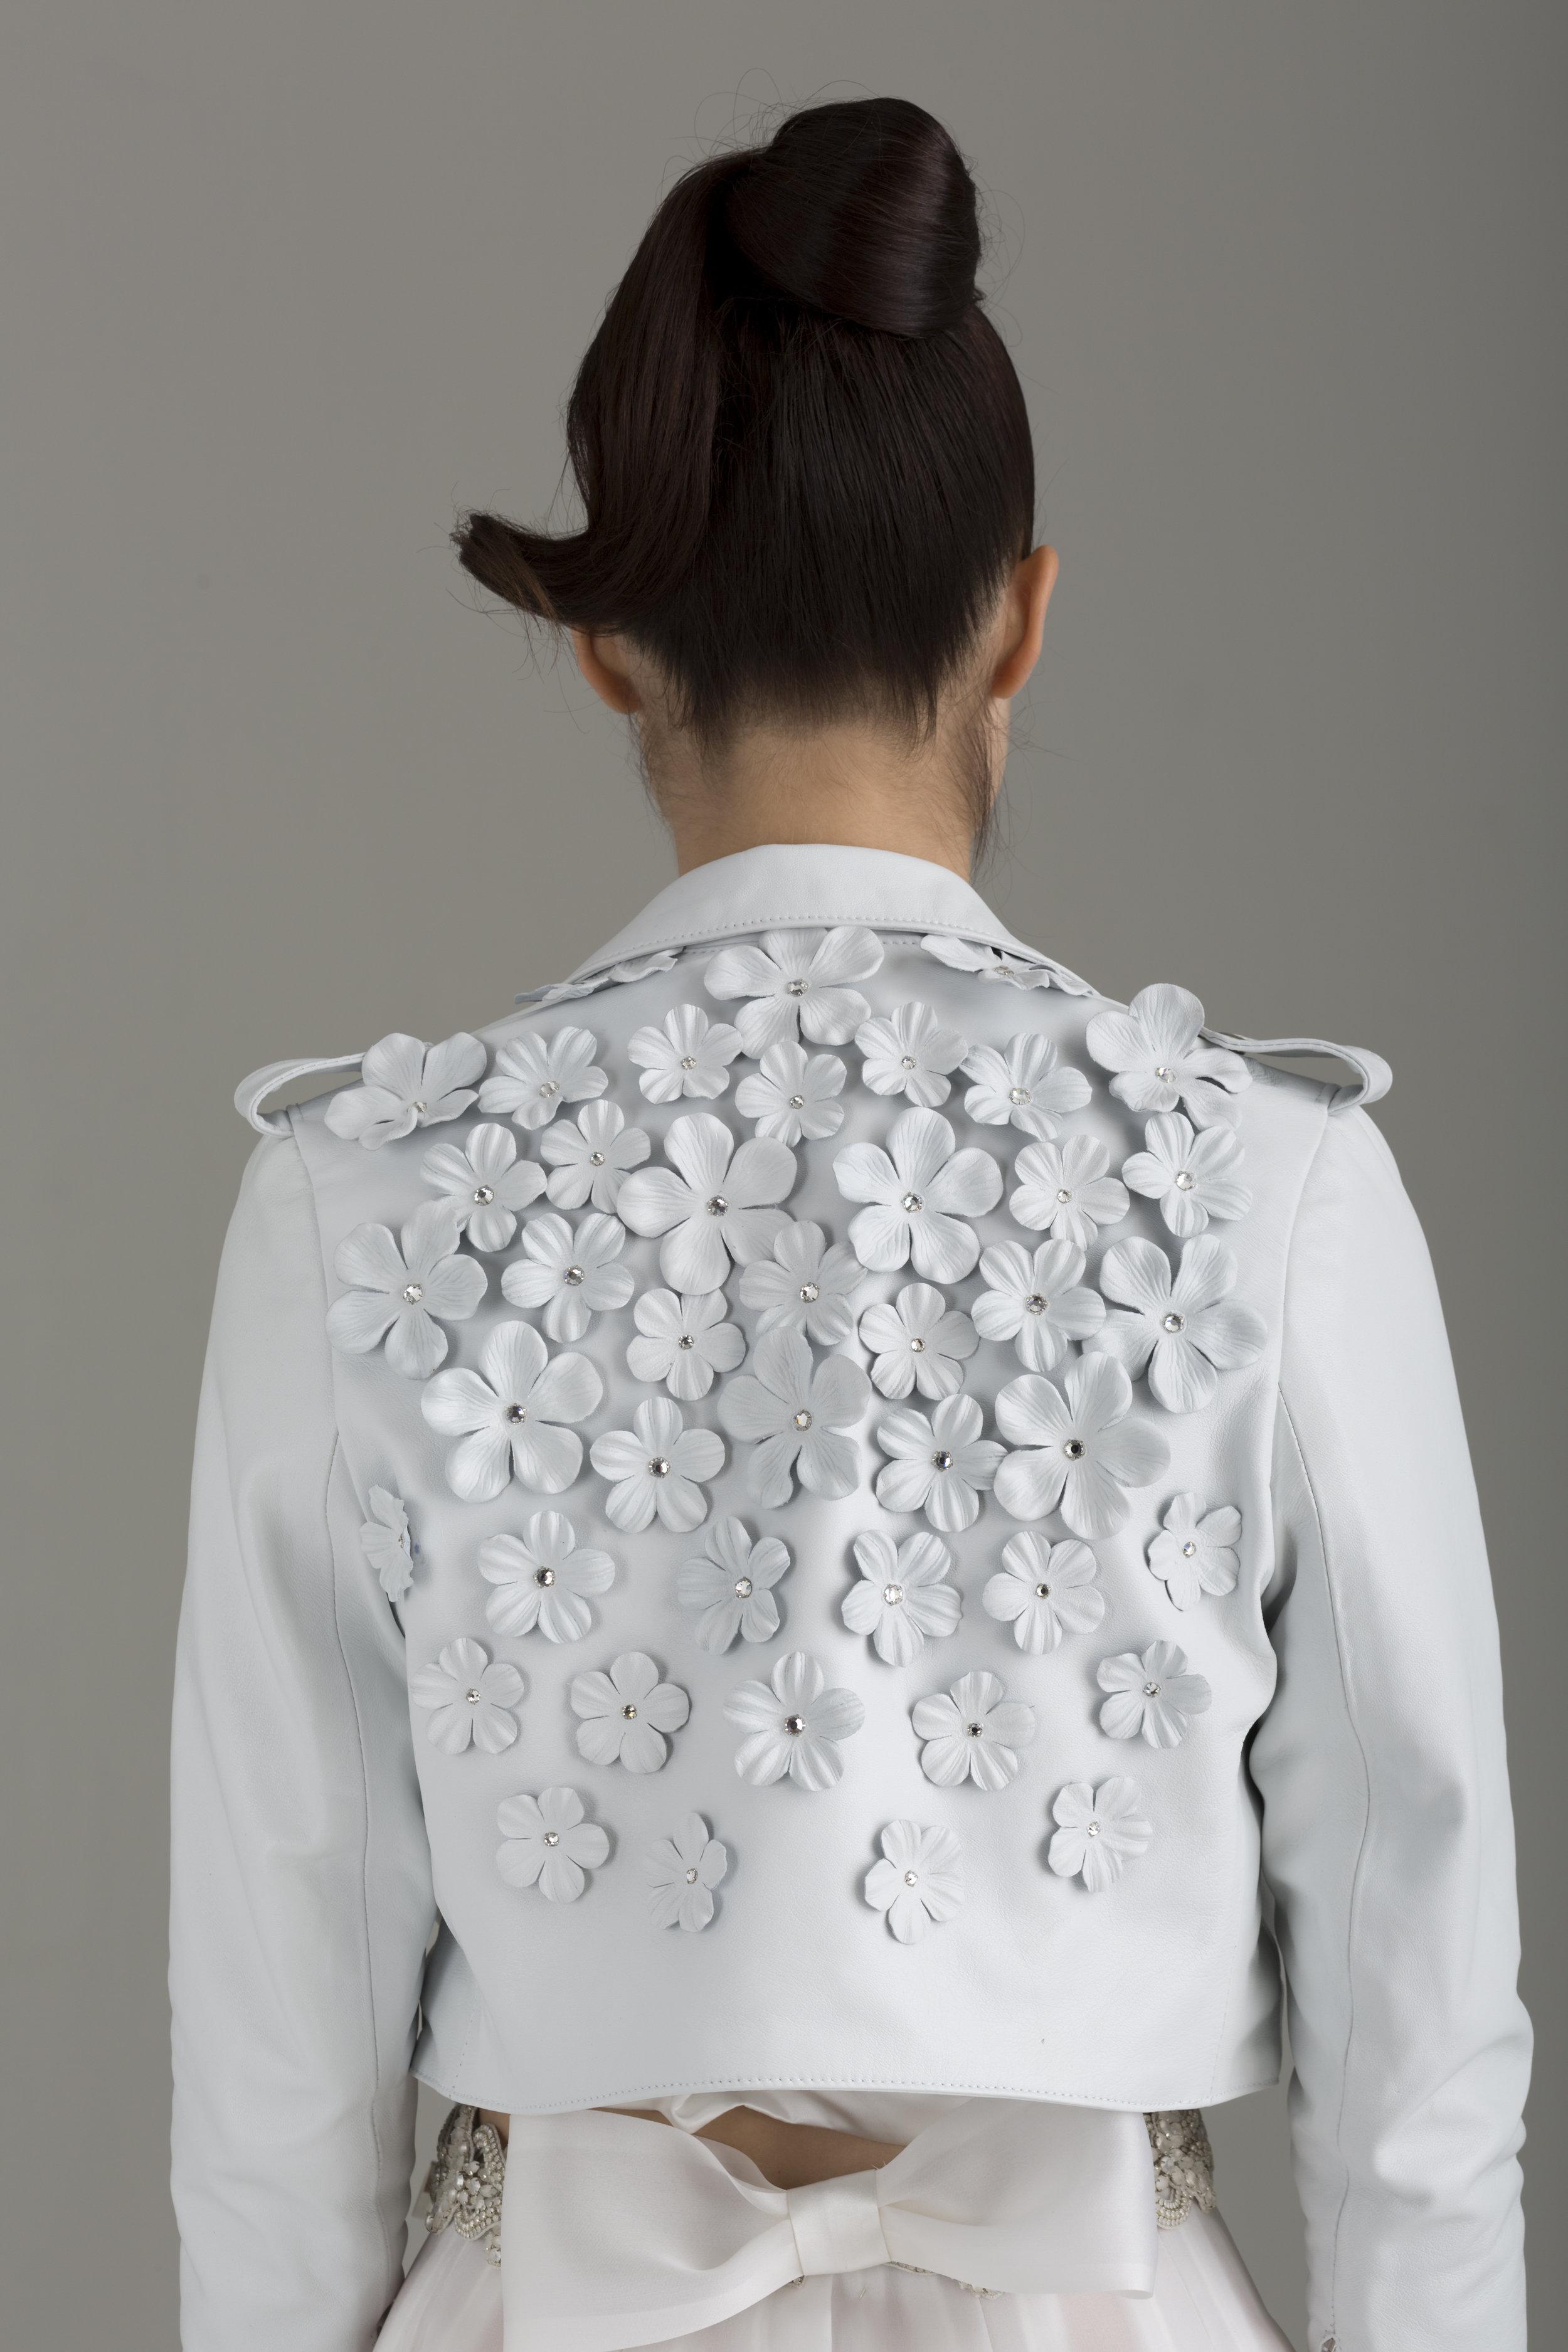 http://www.nathaliekrayninabride.com/nk-bride-wedding-dress-collection-nkb17-81002-nkb17-83005/